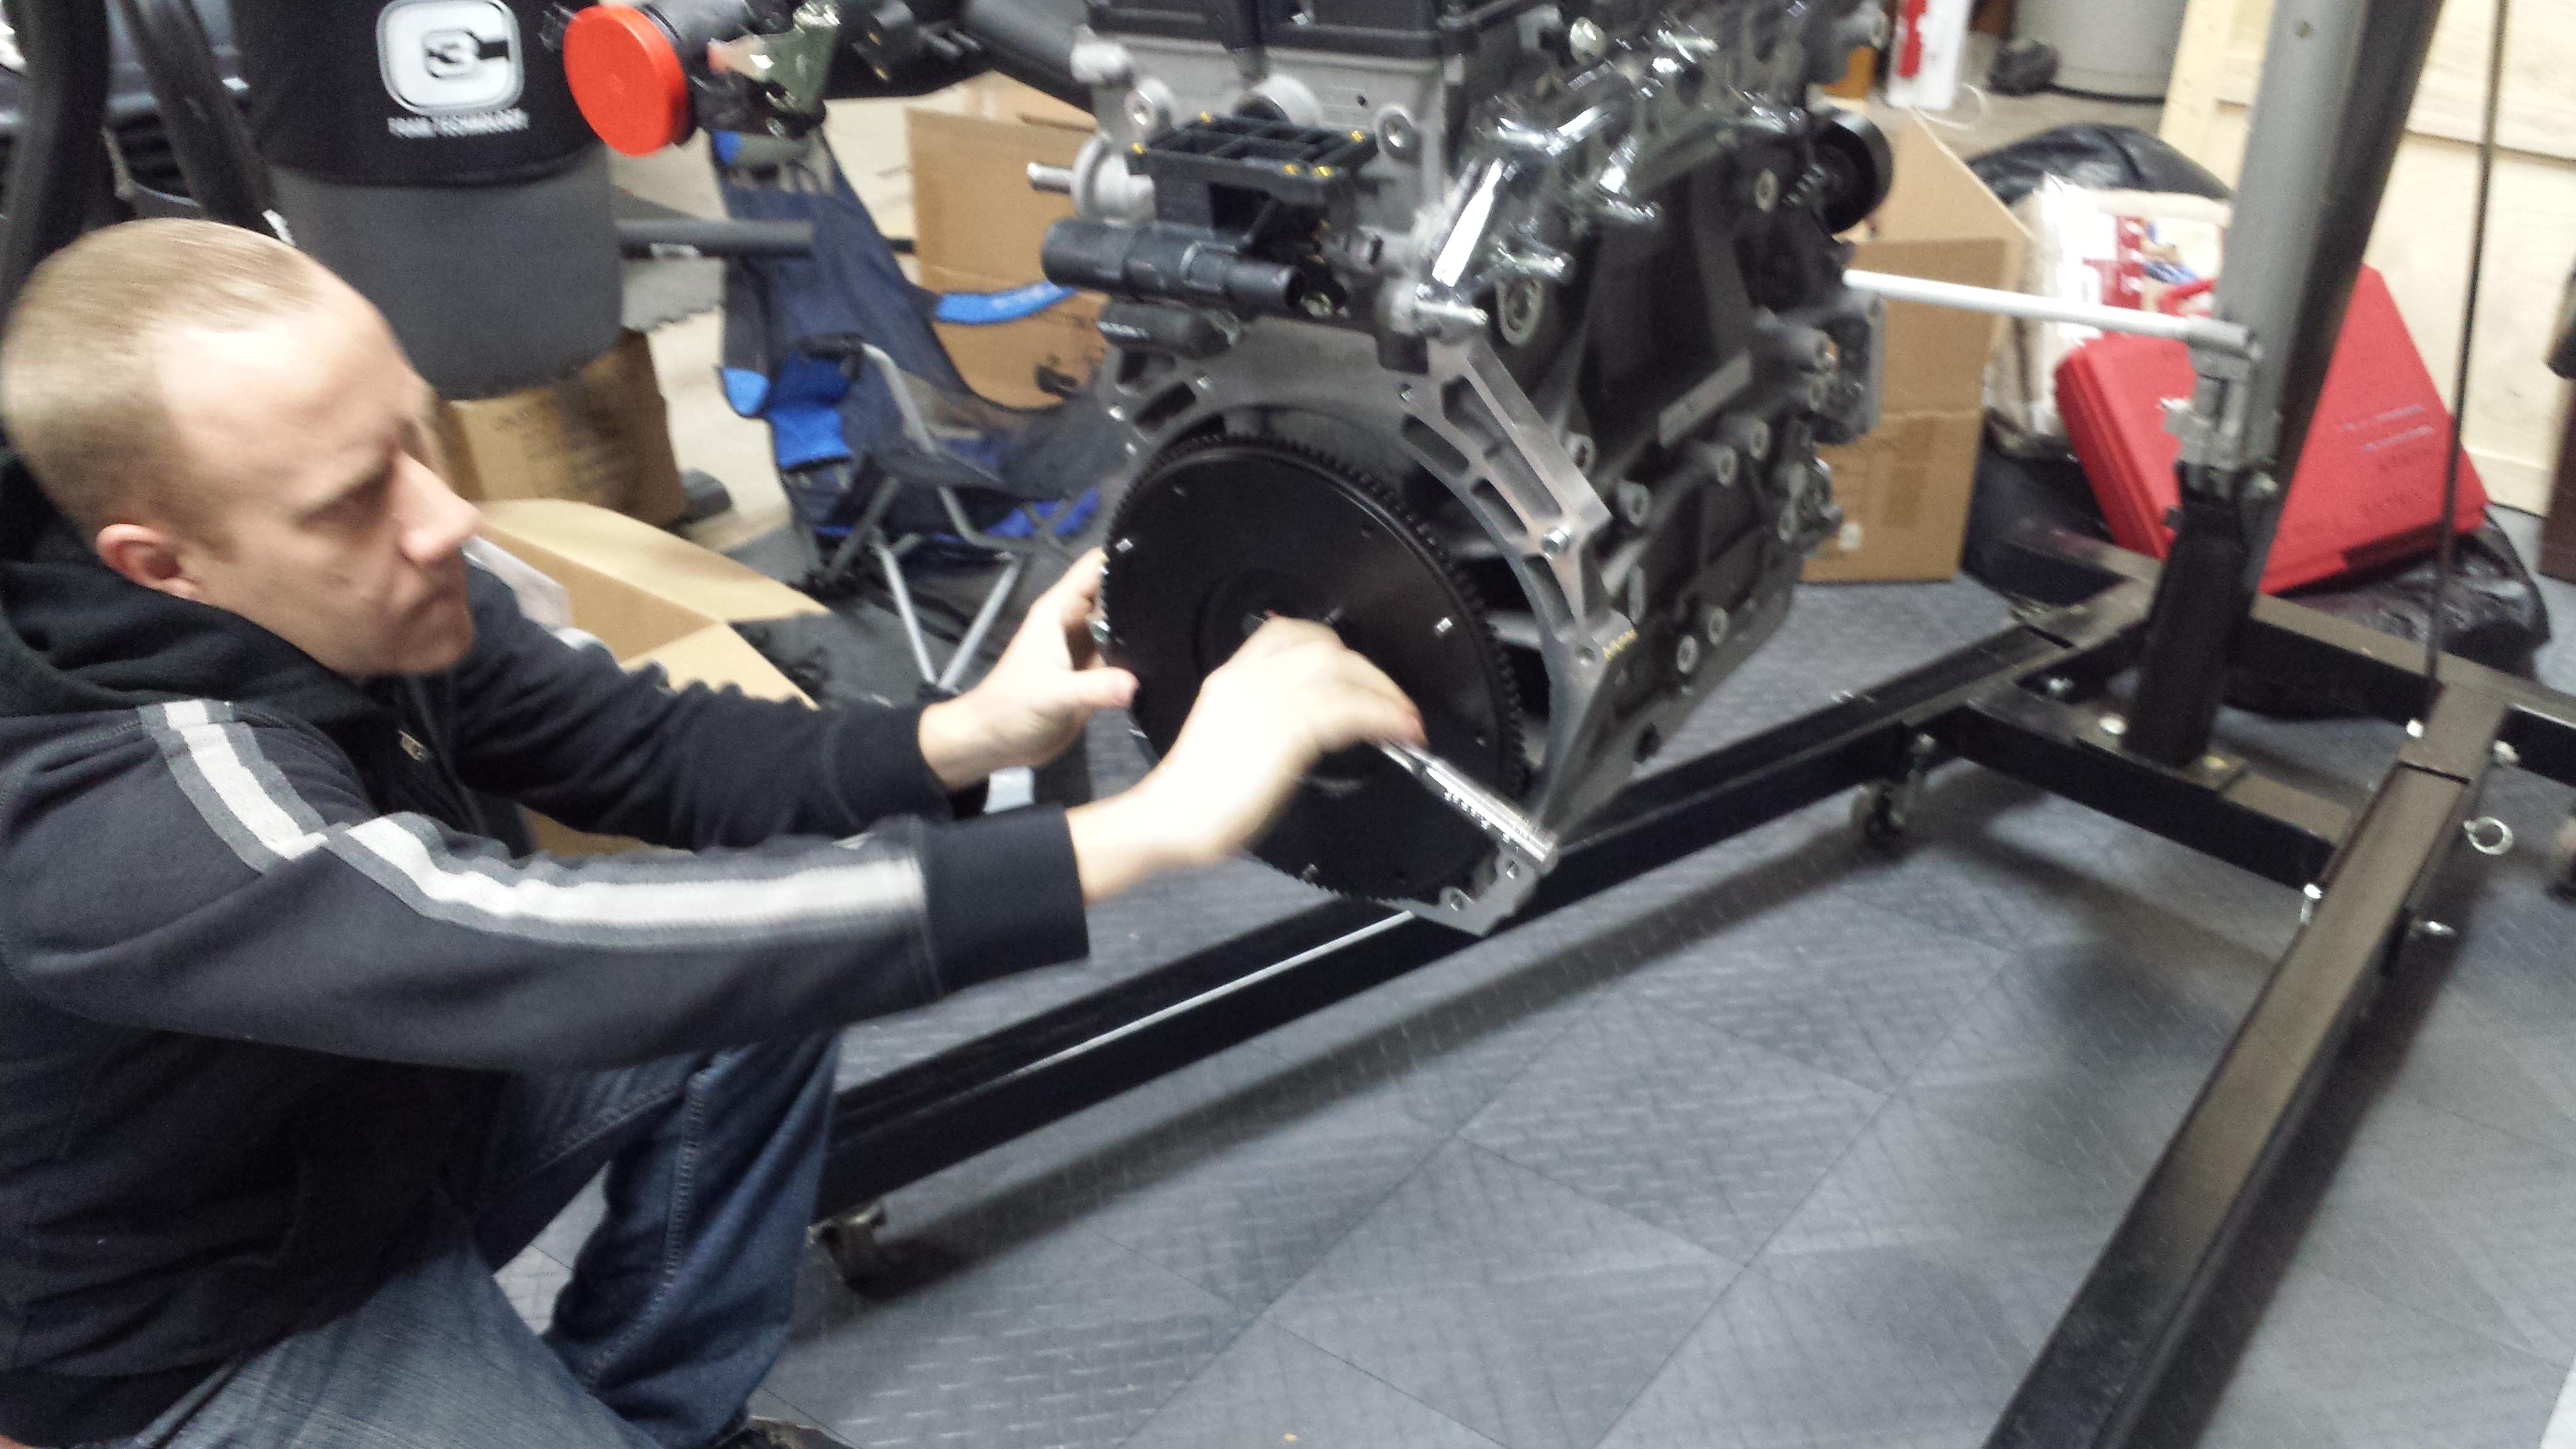 Torquing flywheel bolts